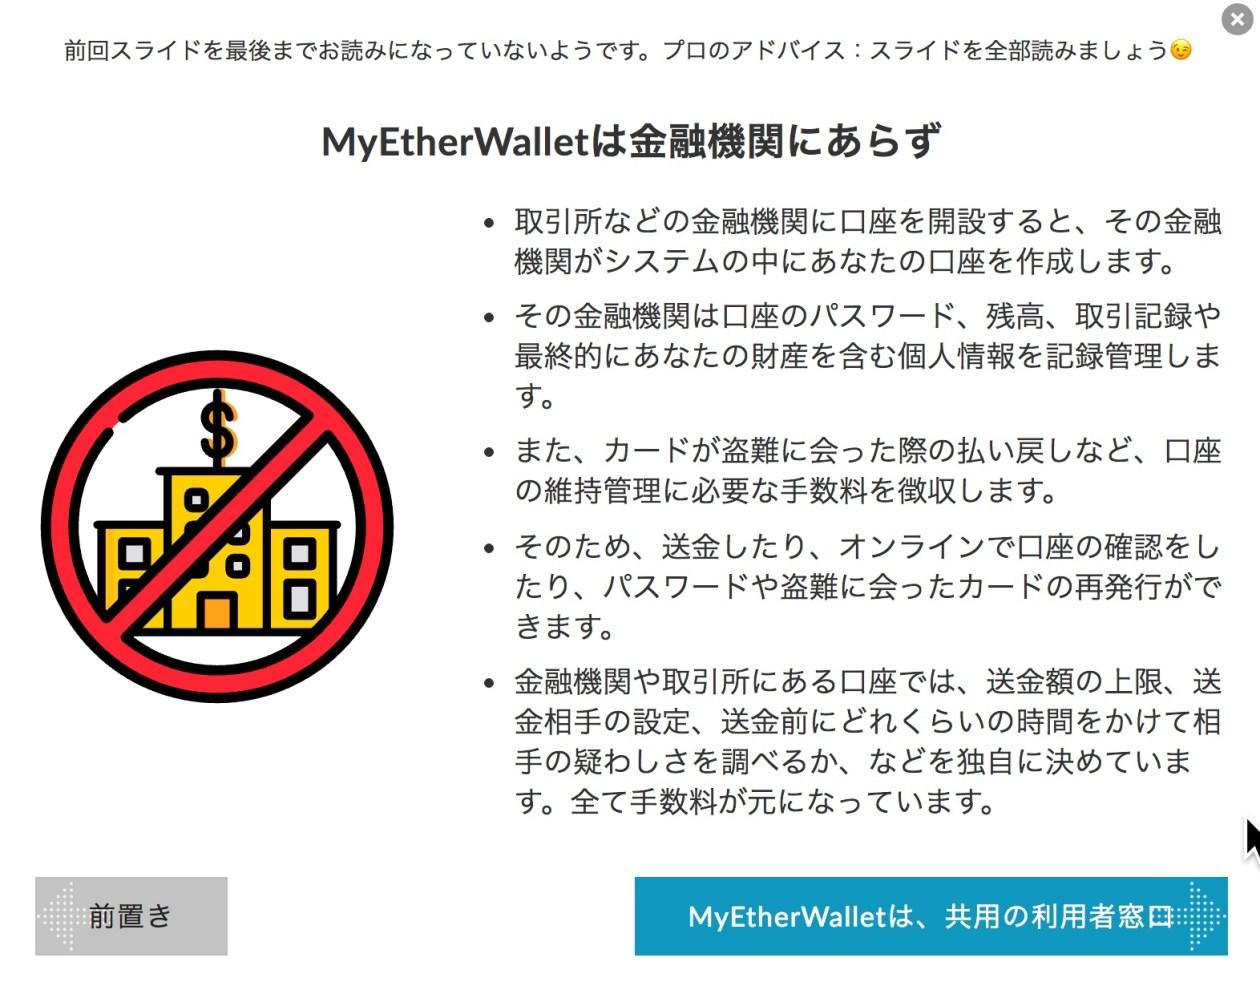 MyEtherWallet com